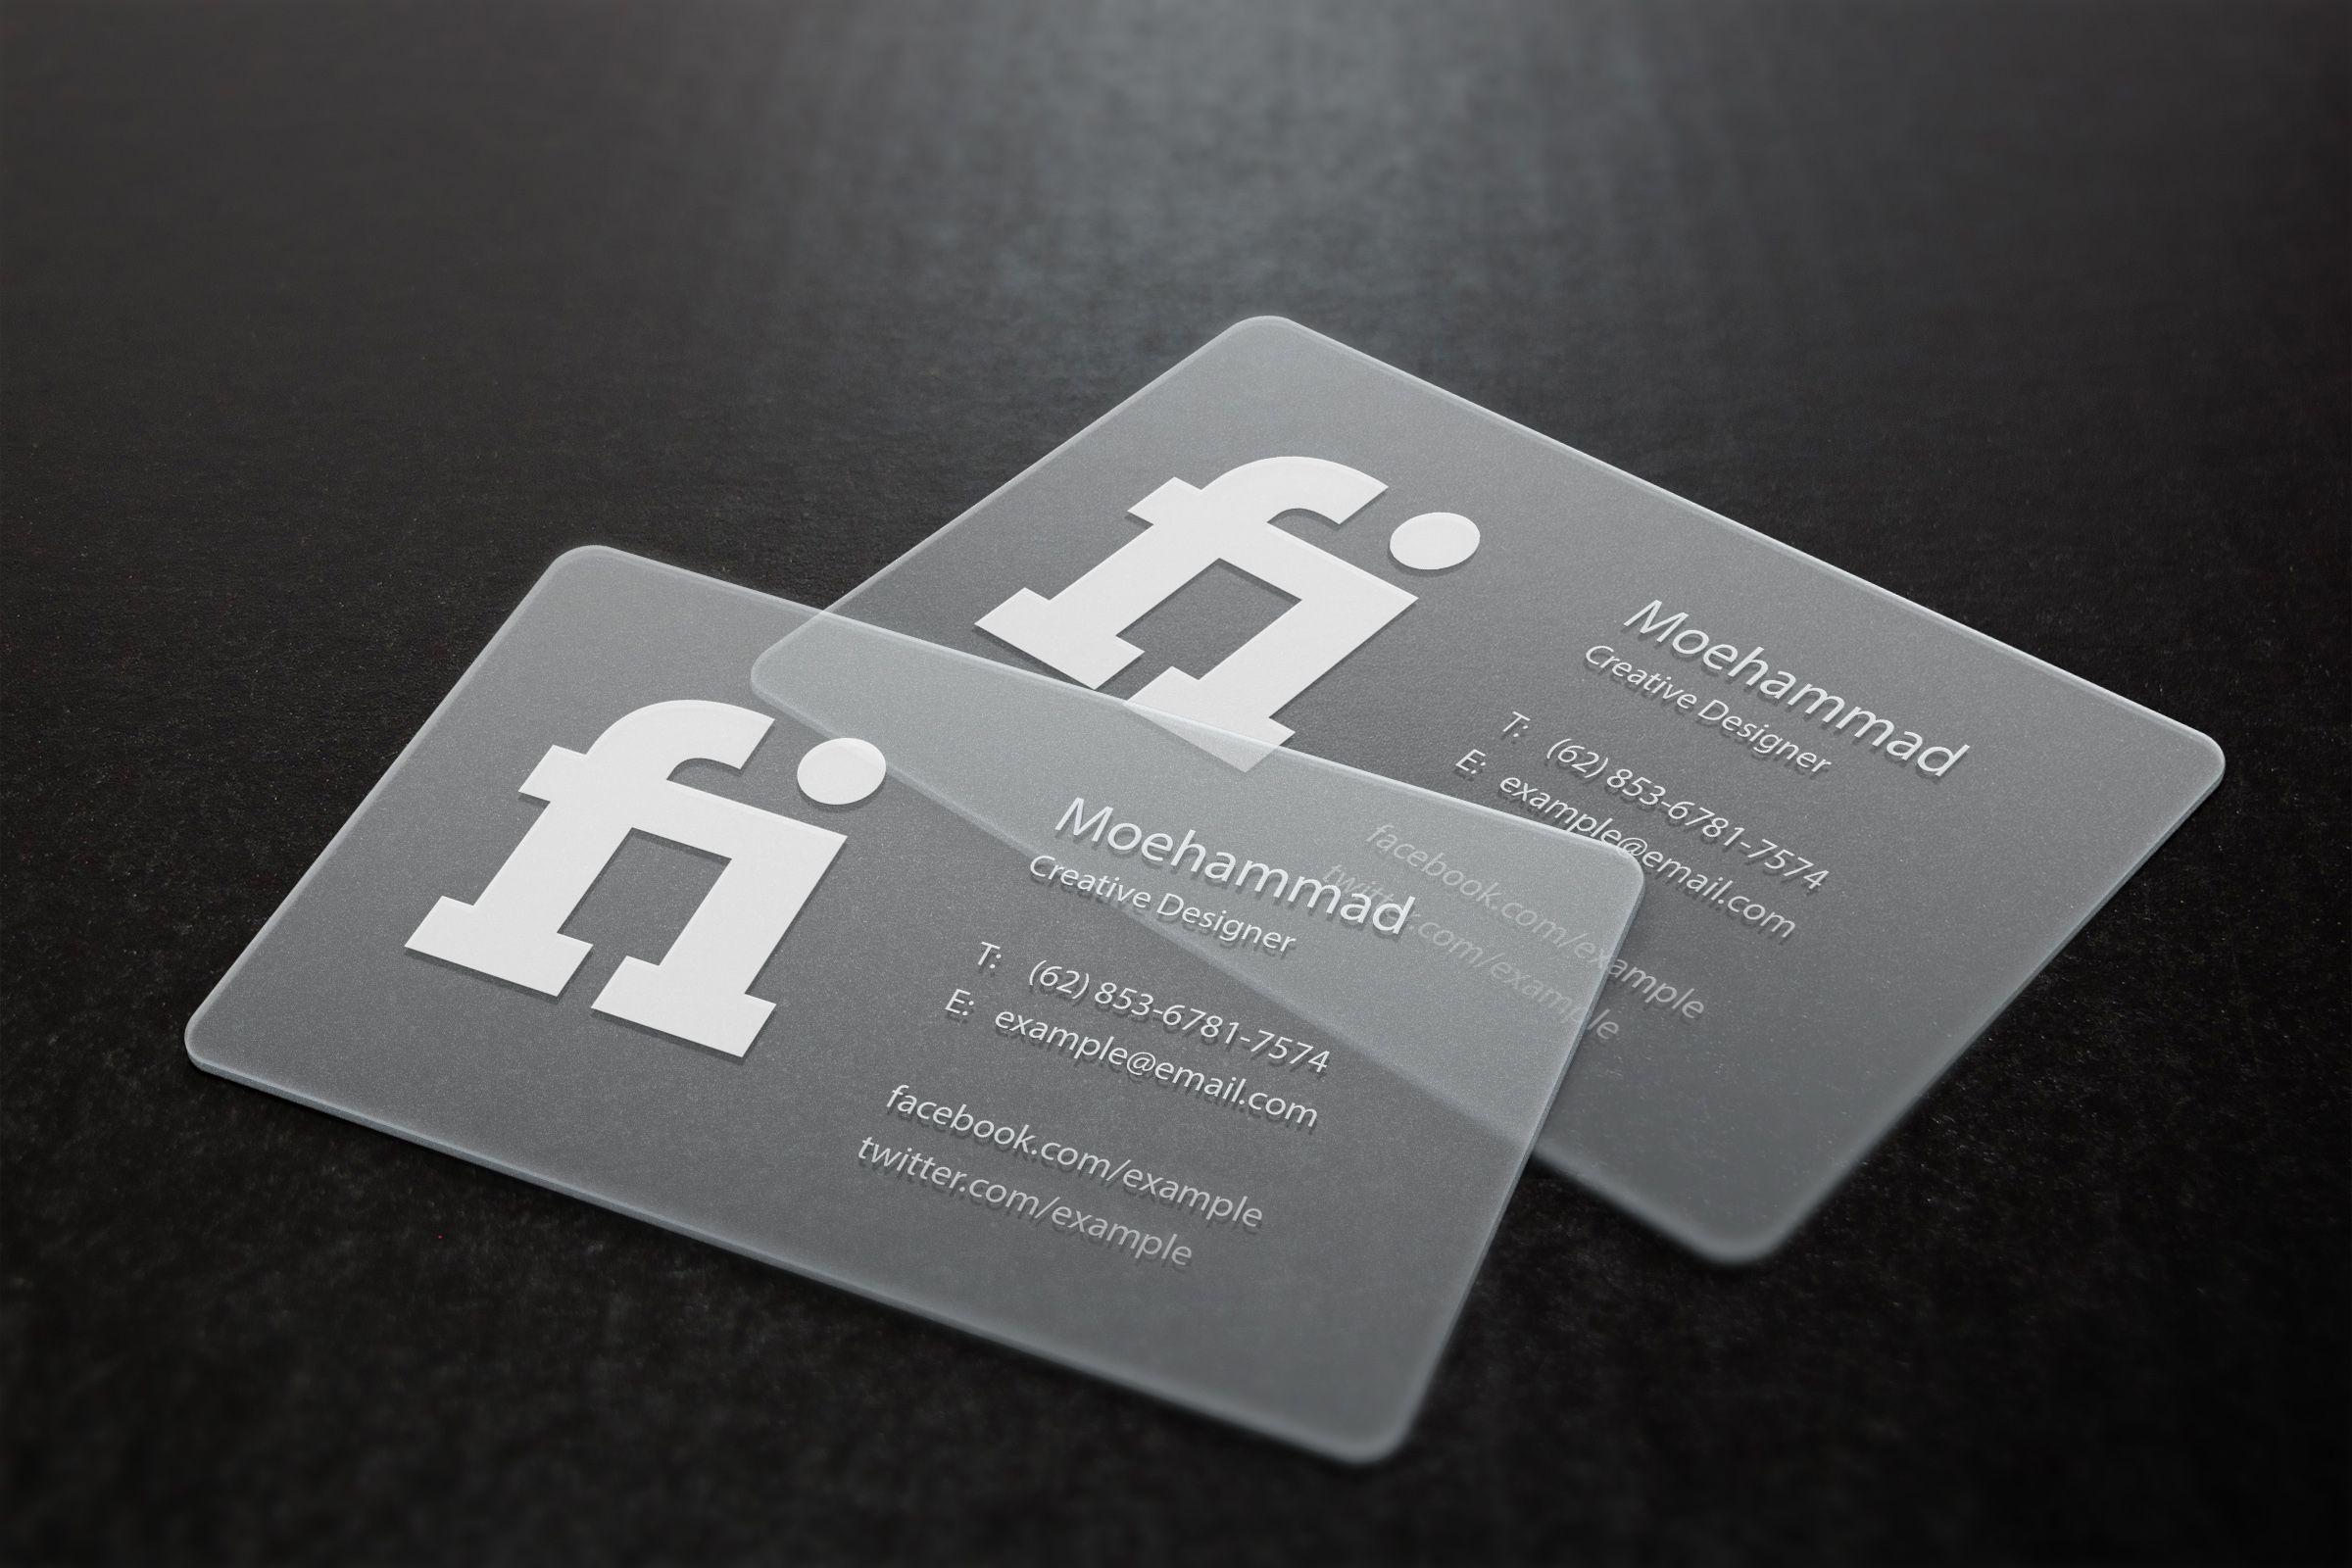 m03h4mm4d: design a transparent business card for $5, on fiverr.com ...